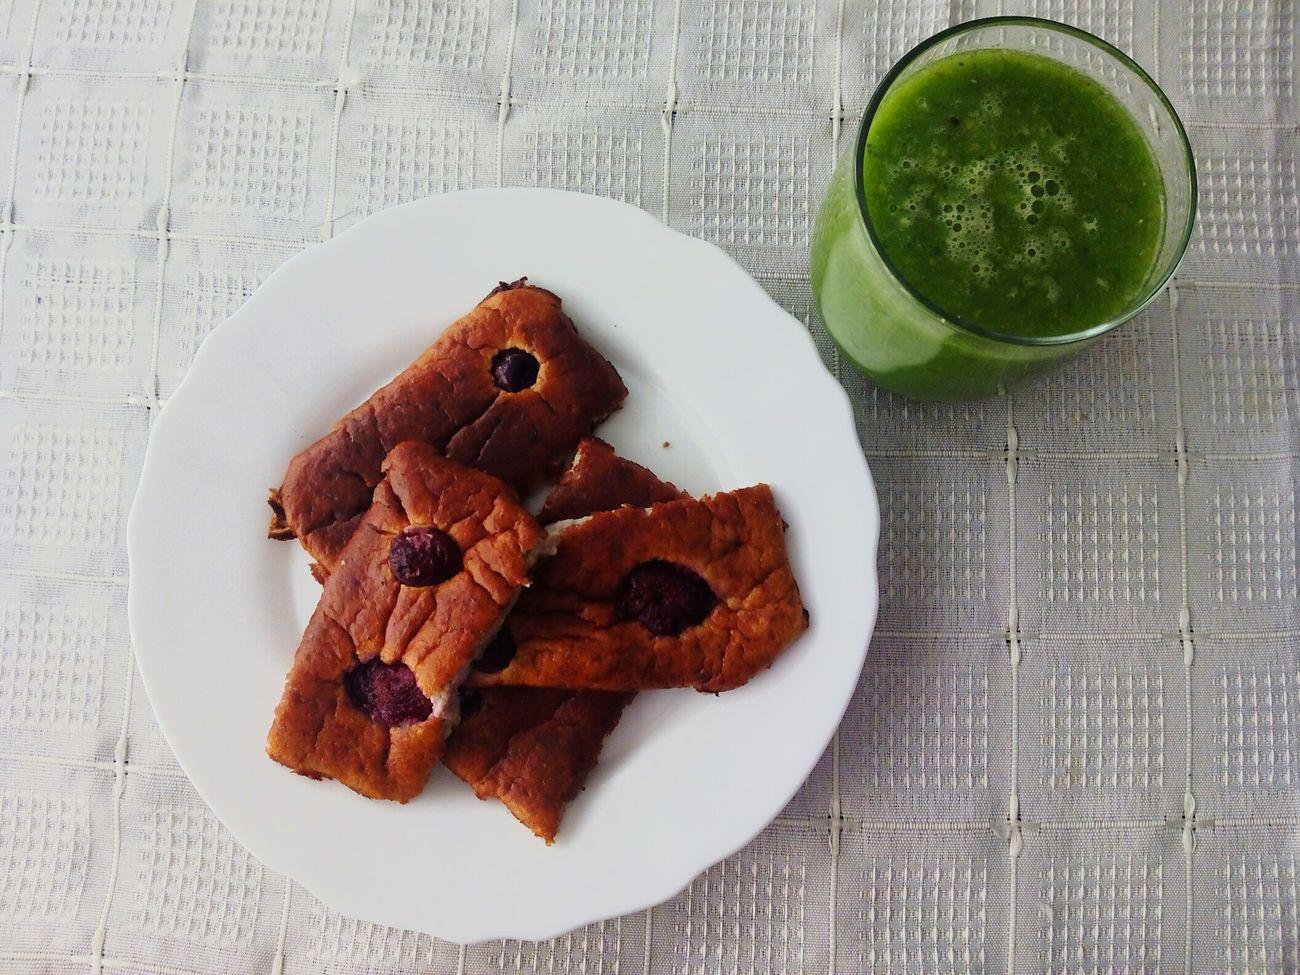 Goodmorning! Healthy Food Health Morning Green Juice Dejeunerausoleil Salud Desayuno Saludable Yummy Hand Made